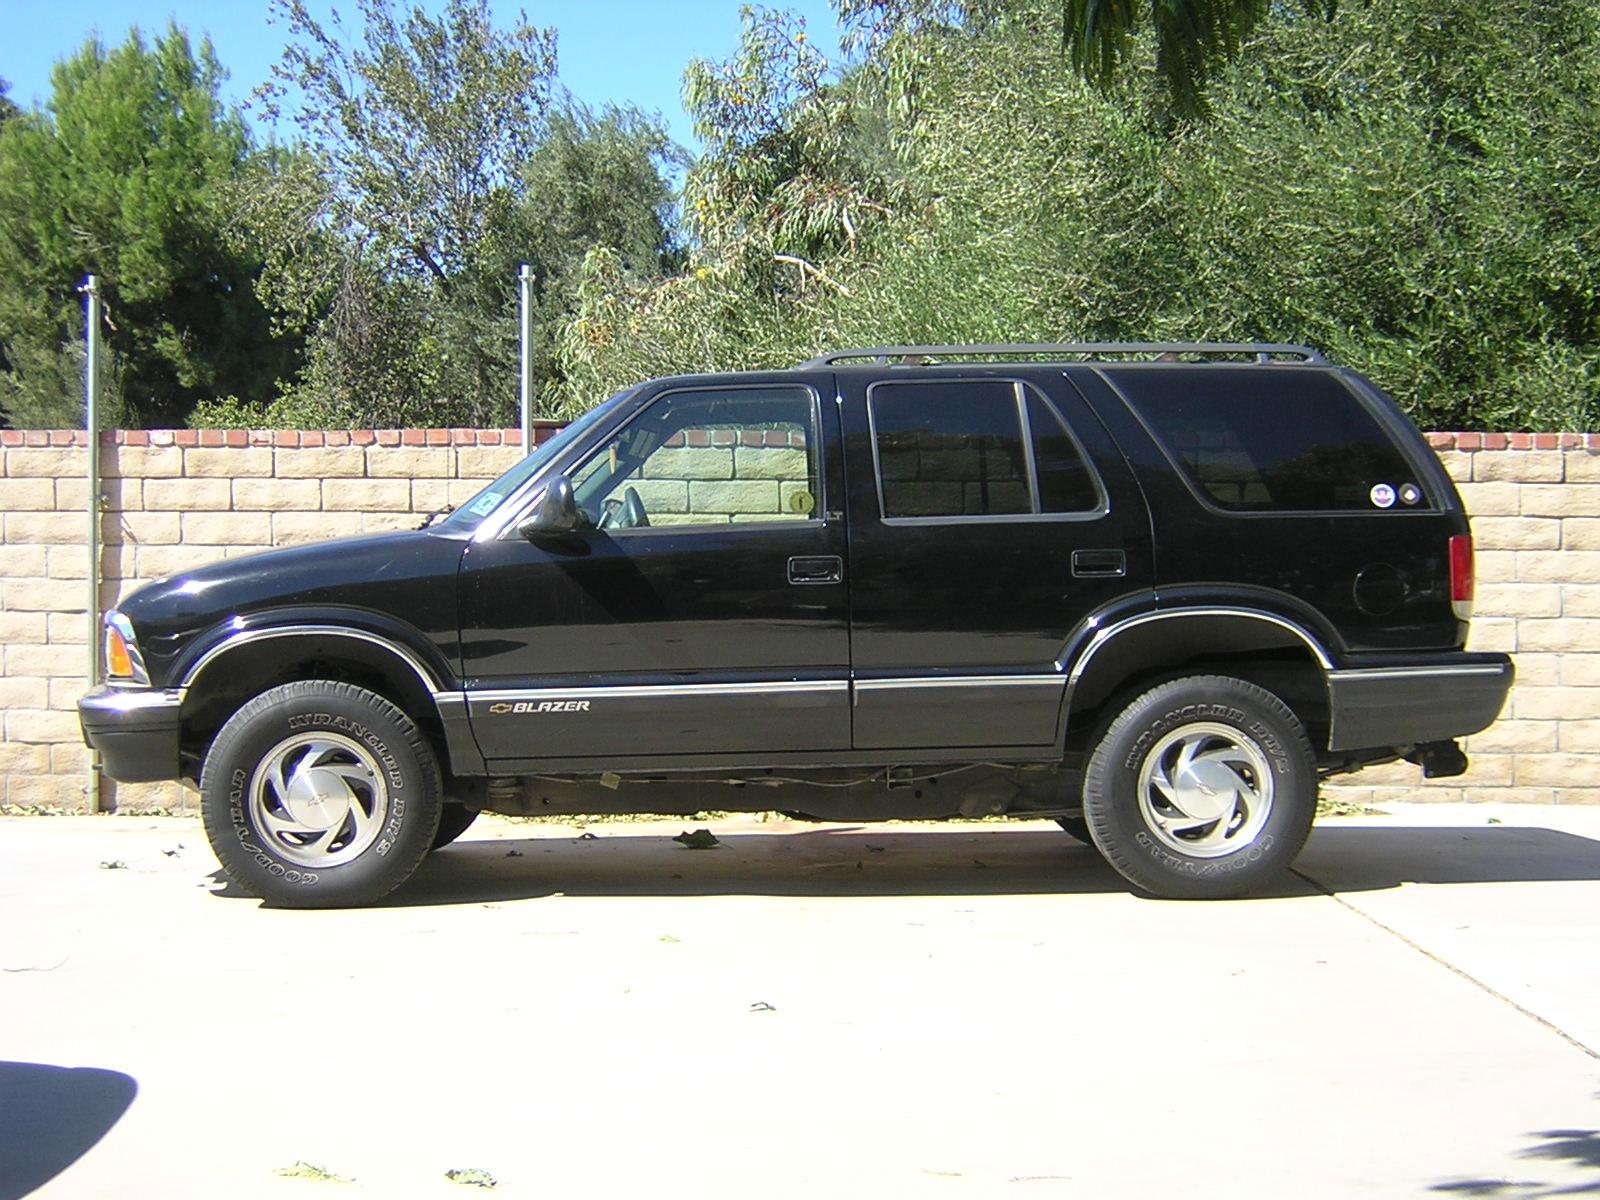 1999 Gmc Suburban Wiring Diagram Headlights Free 97 Fuse Box 1996 Chevy Tahoe 2 Door Wd Autos Post Jimmy